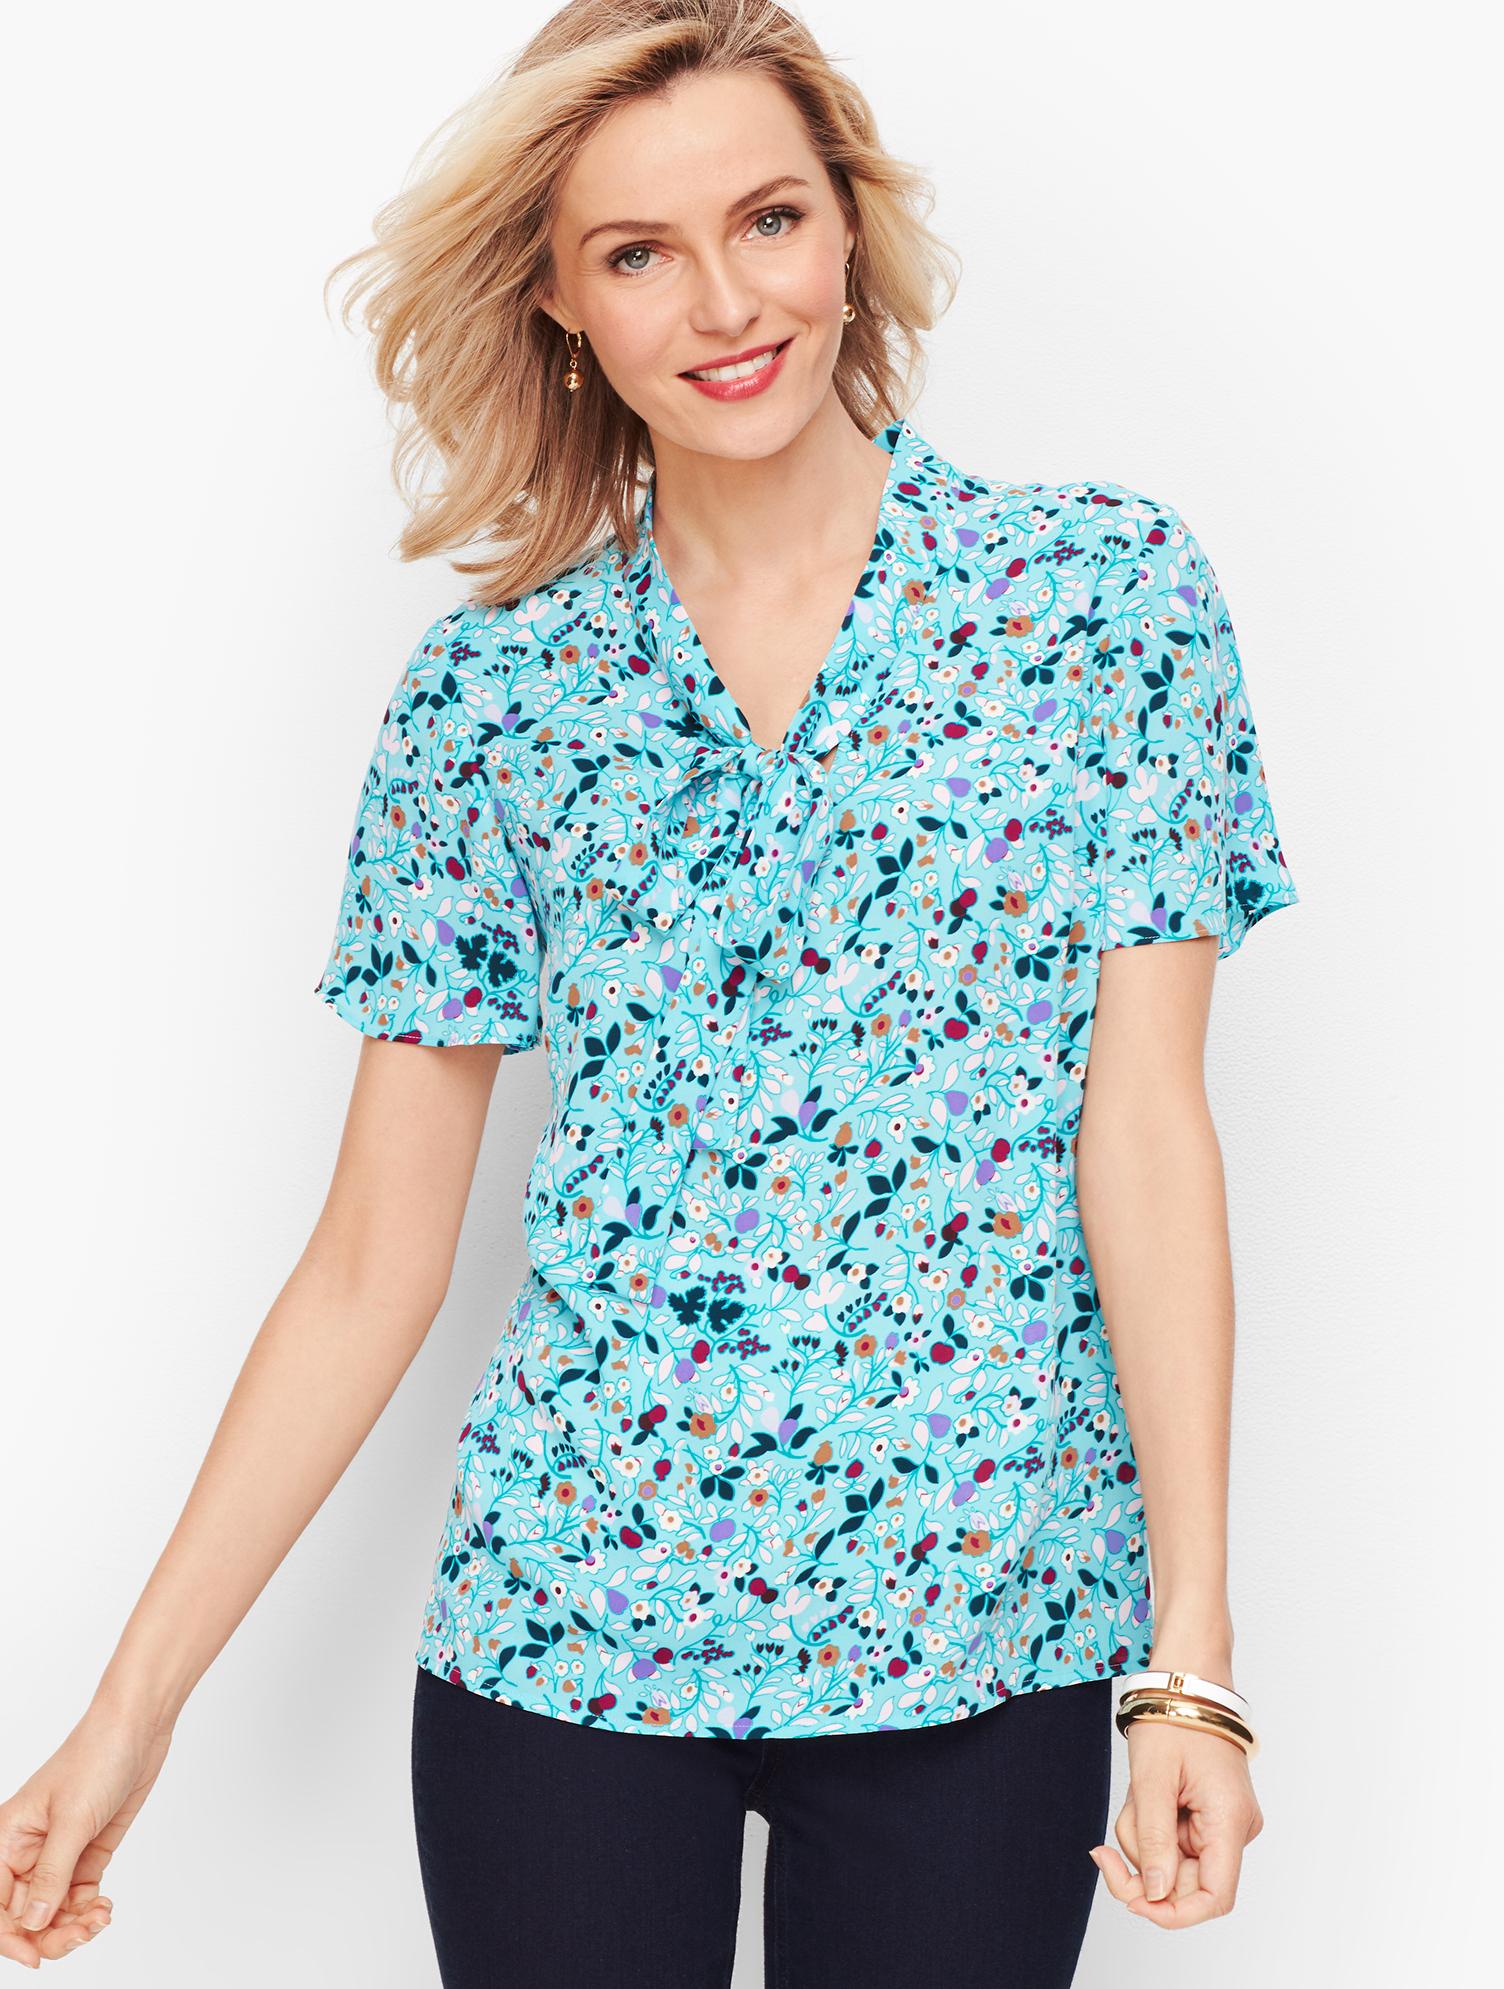 1930s Style Blouses, Shirts, Tops | Vintage Blouses Flutter Sleeve Tie Top - Floral - EGGSHELL-BLUE - XL - Talbots $79.50 AT vintagedancer.com